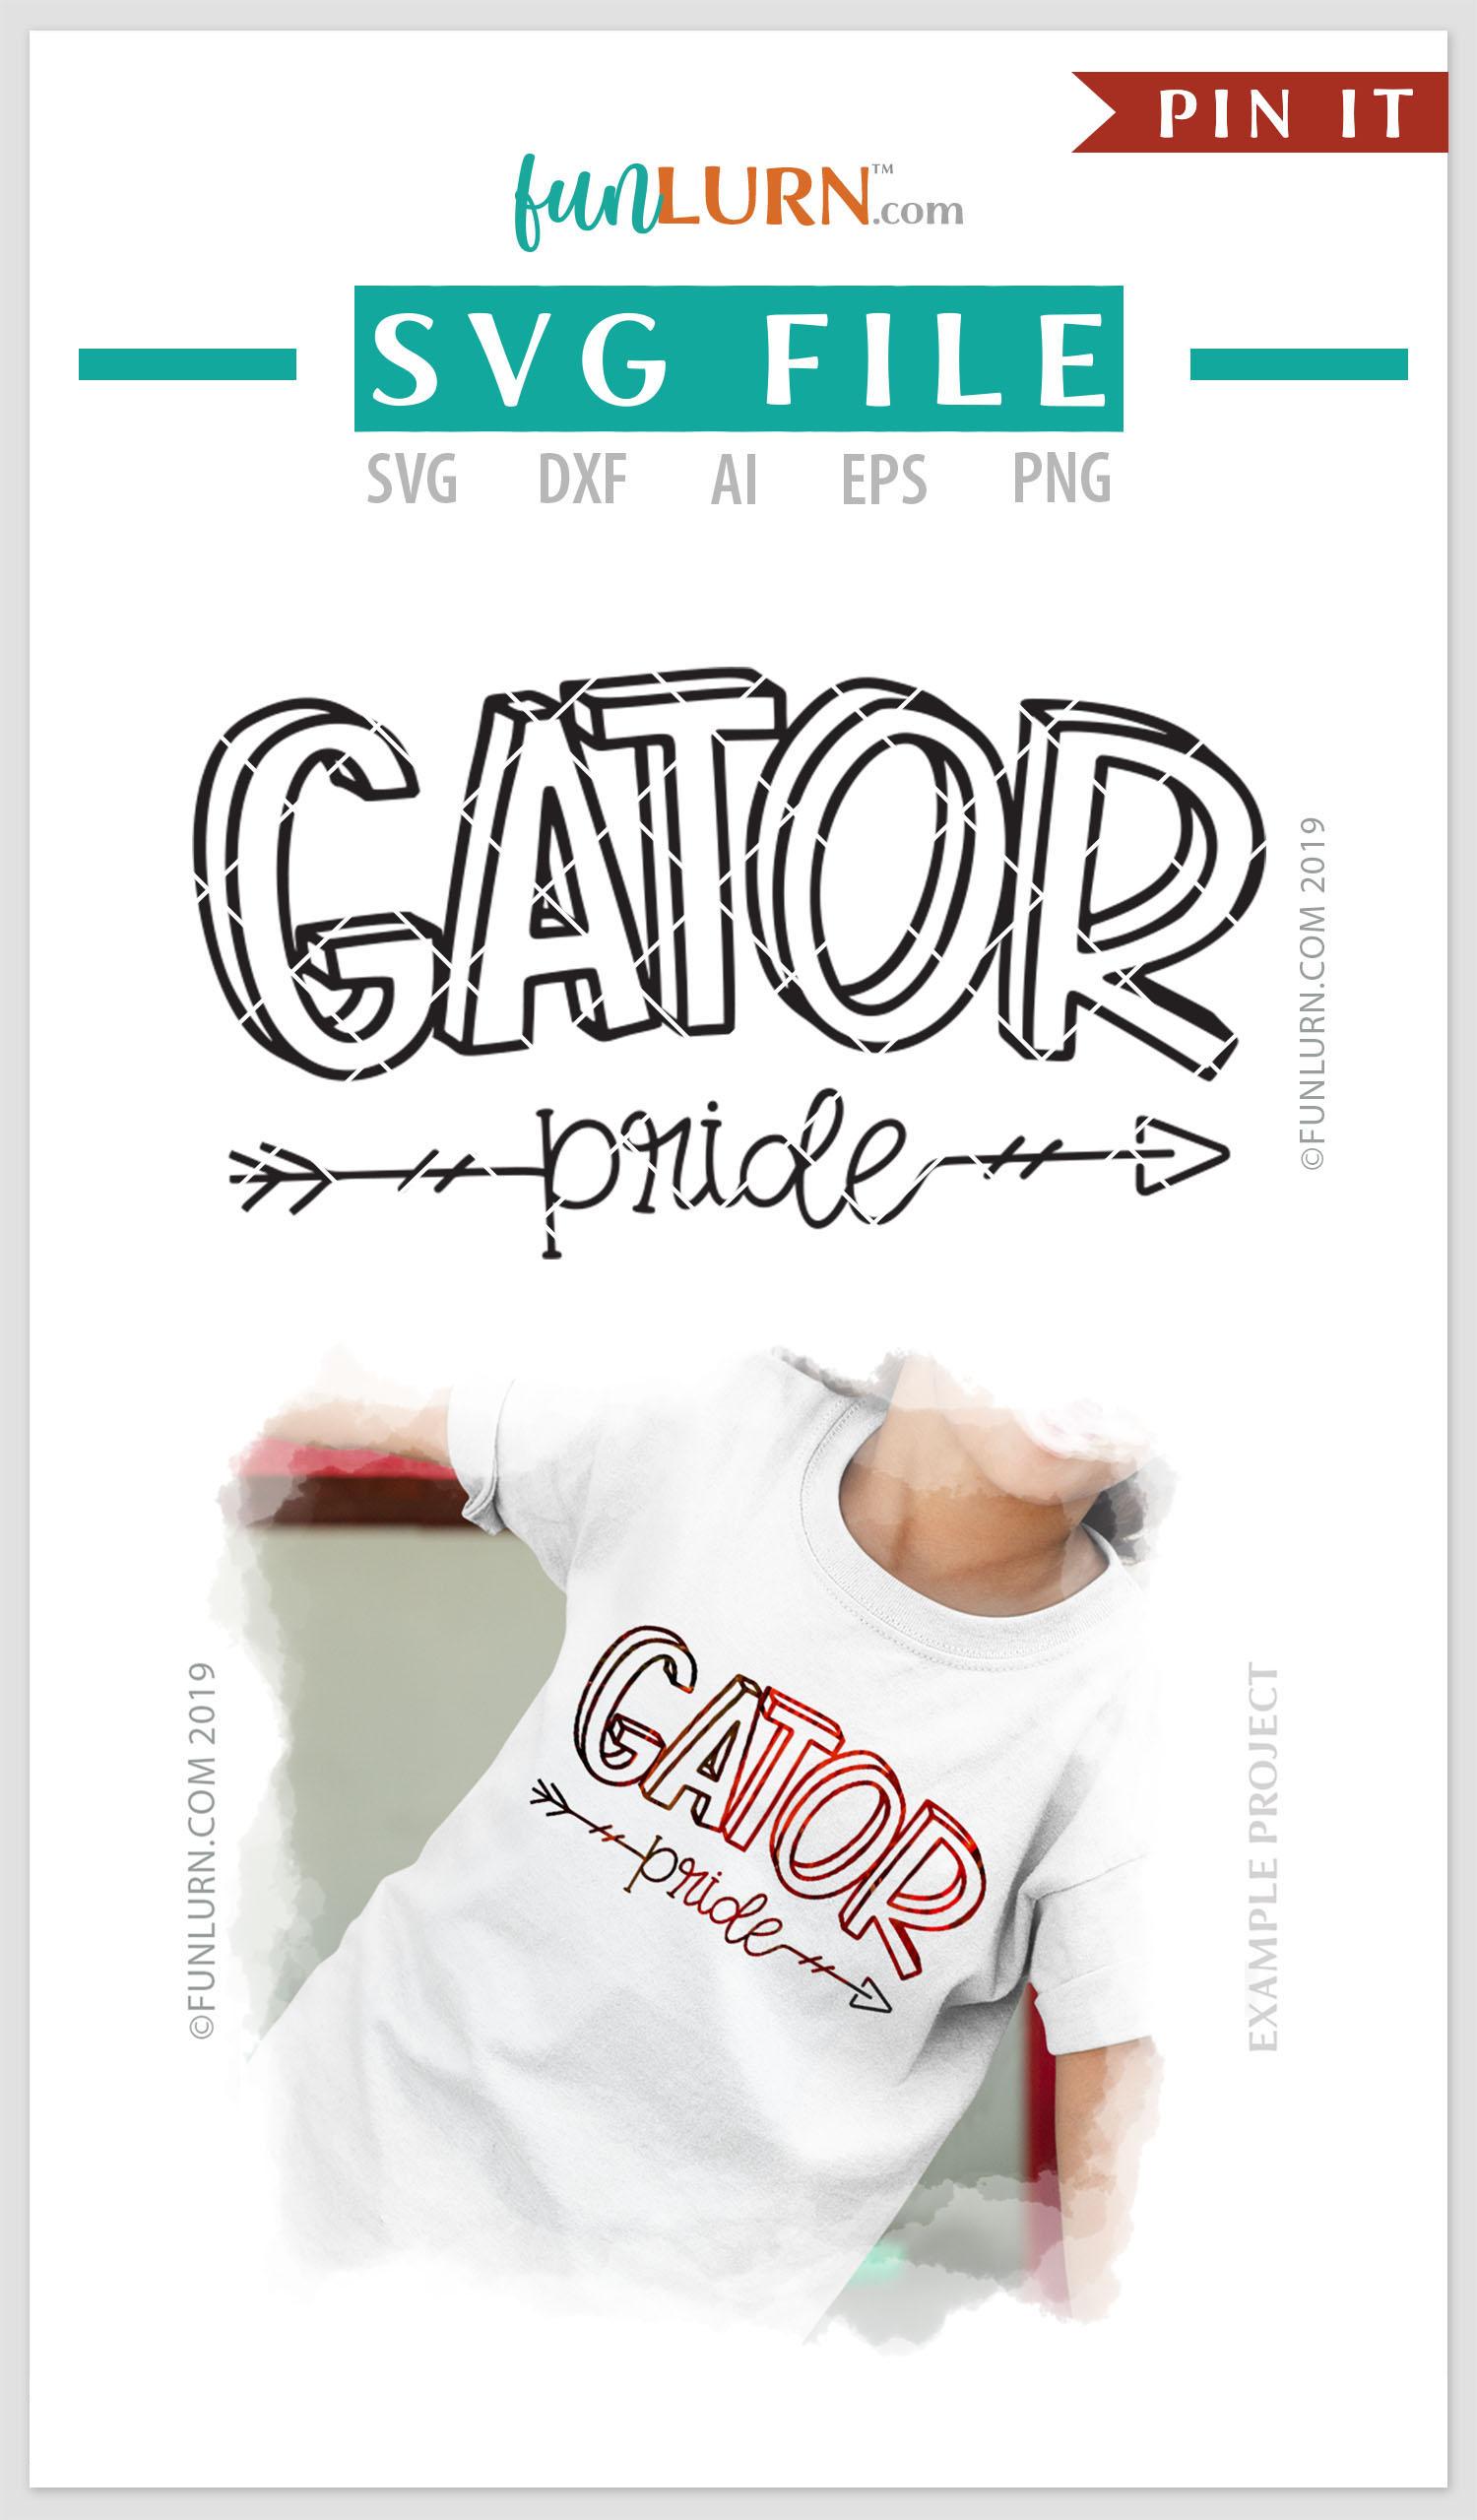 Gator Pride Team SVG Cut File example image 4